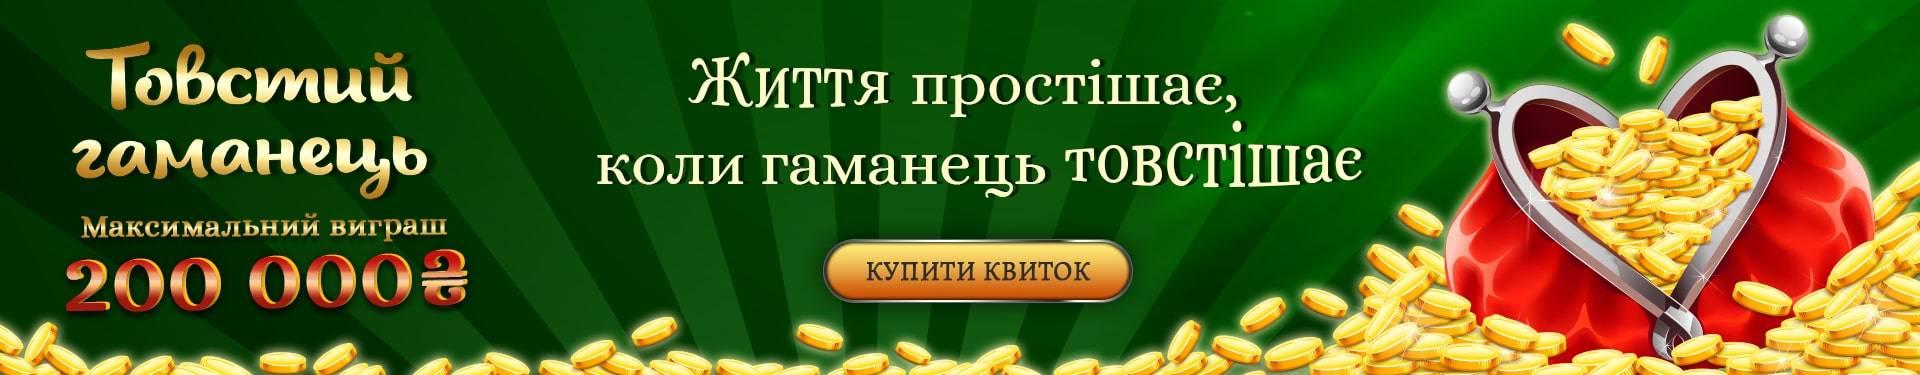 Таро и лотерея: расклад на выигрыш